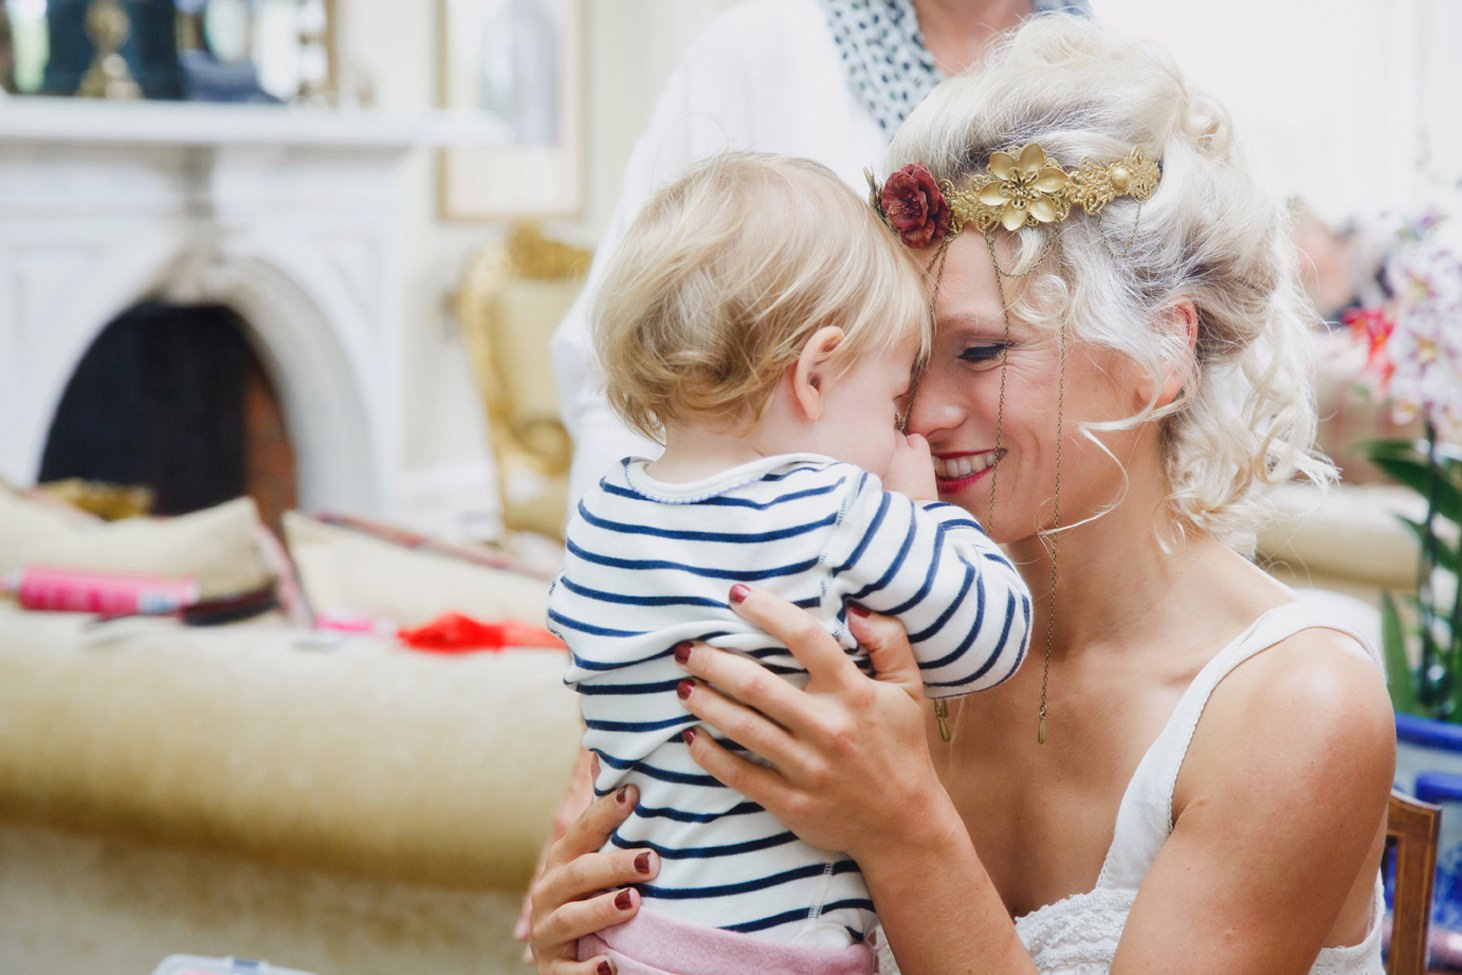 mount stuart wedding photography bride and her niece